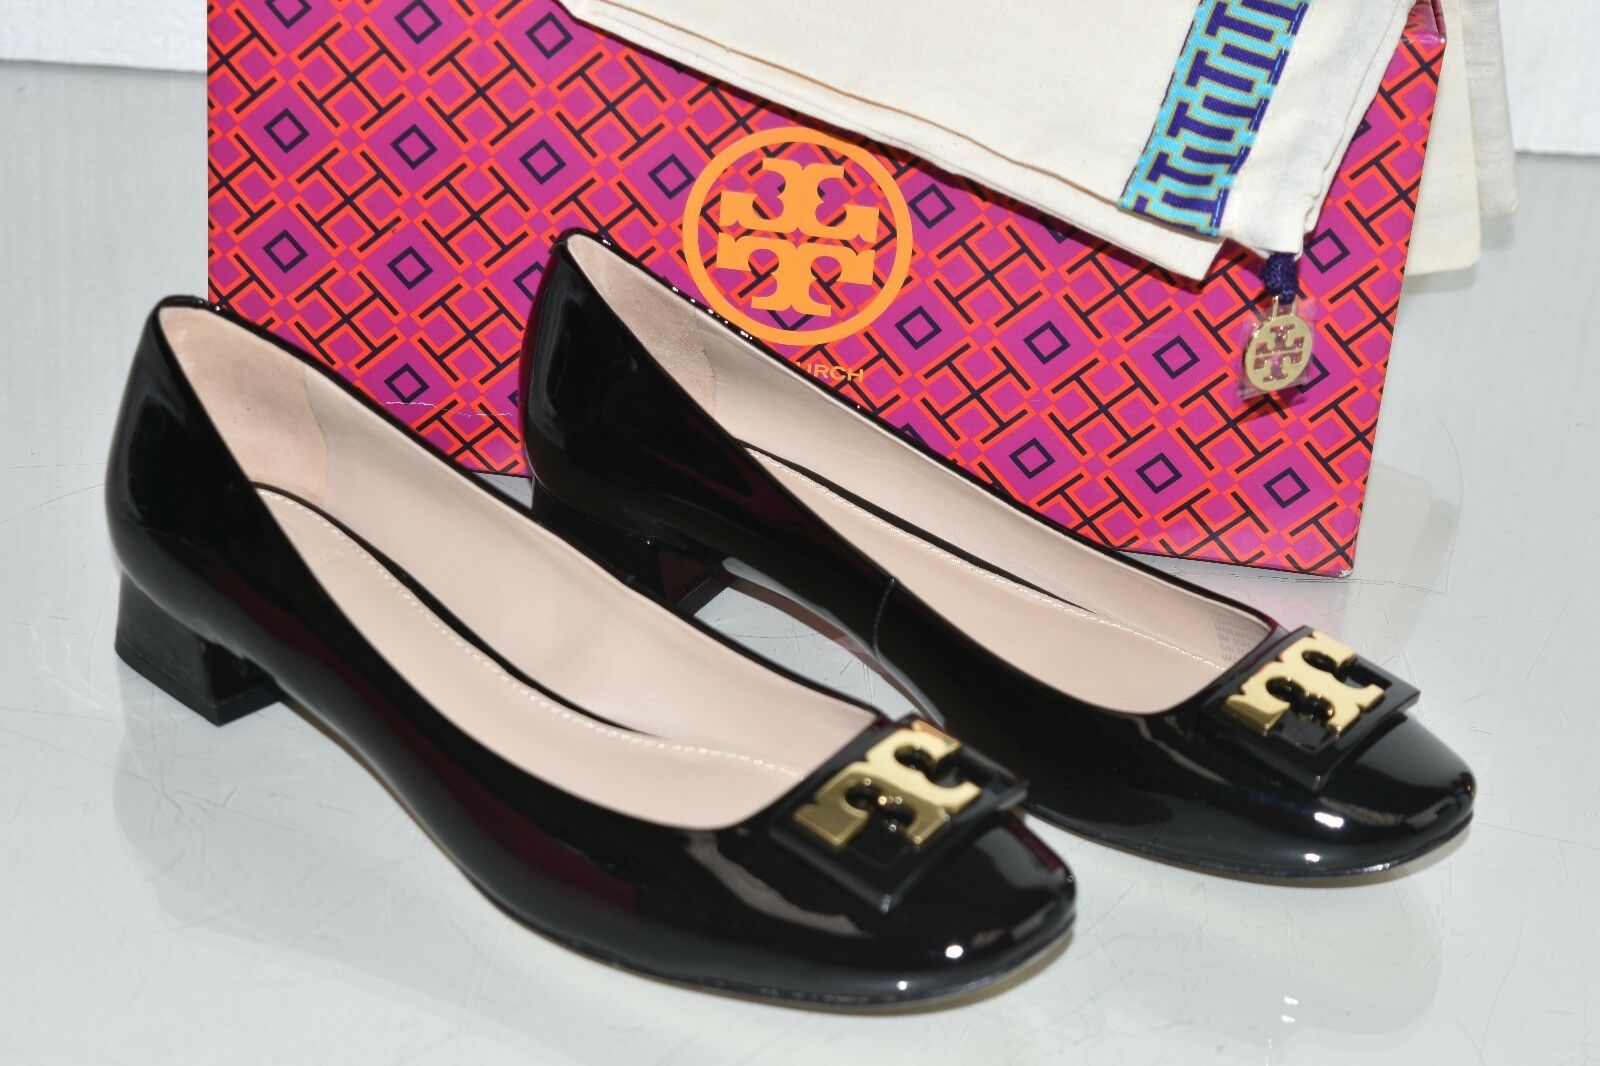 Nuevas bombas de Tory Burch Gigi Gigi Gigi Suave Charol Negro oro Logo Flats zapatos 8 9.5  venta con descuento